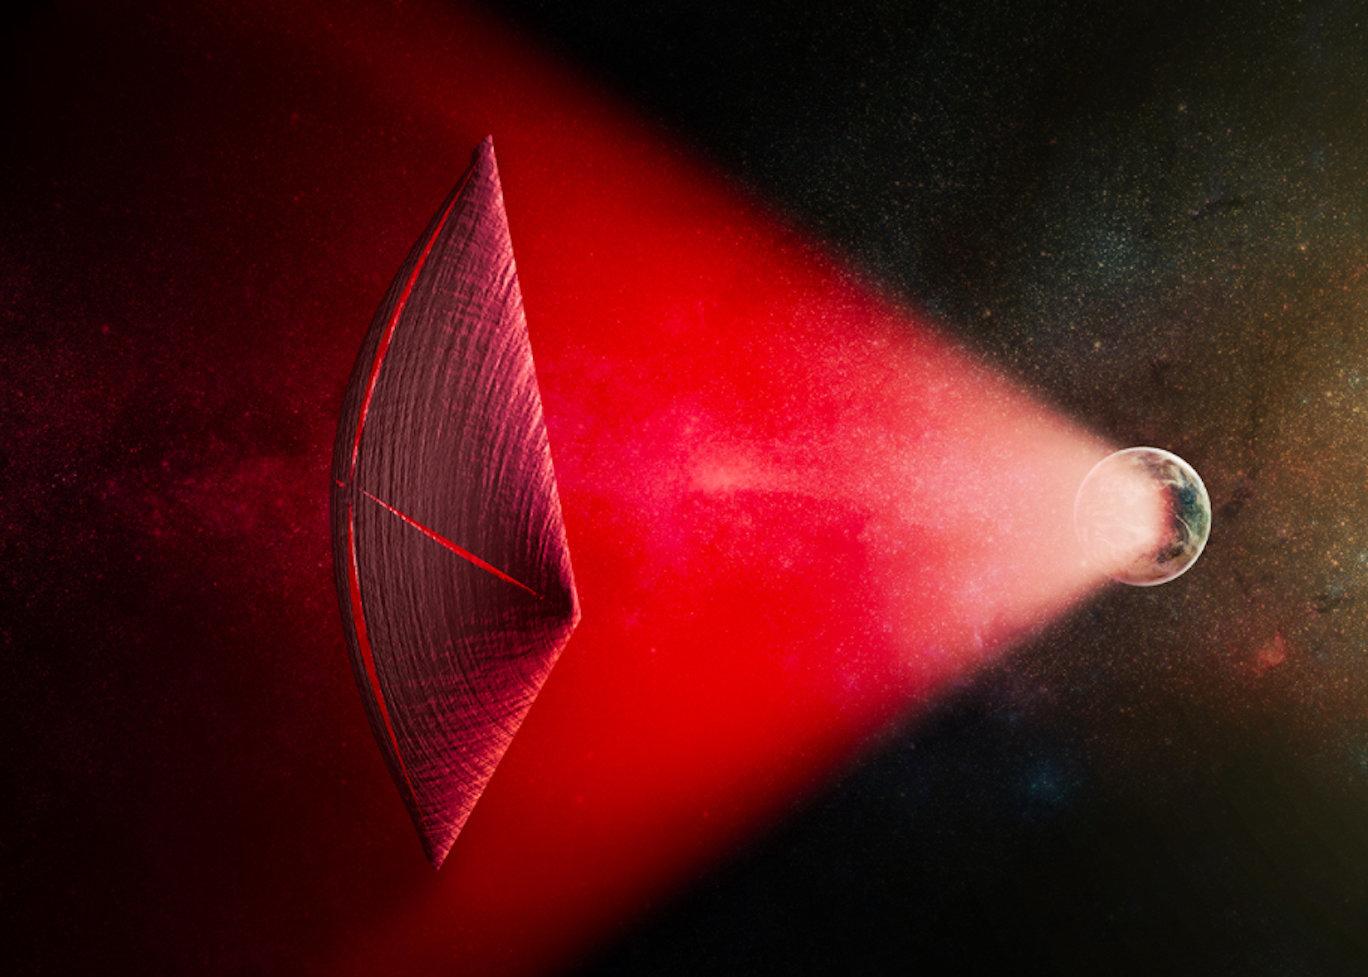 Harvard Scientists Say Aliens May Be Using Radio Beams To Travel The